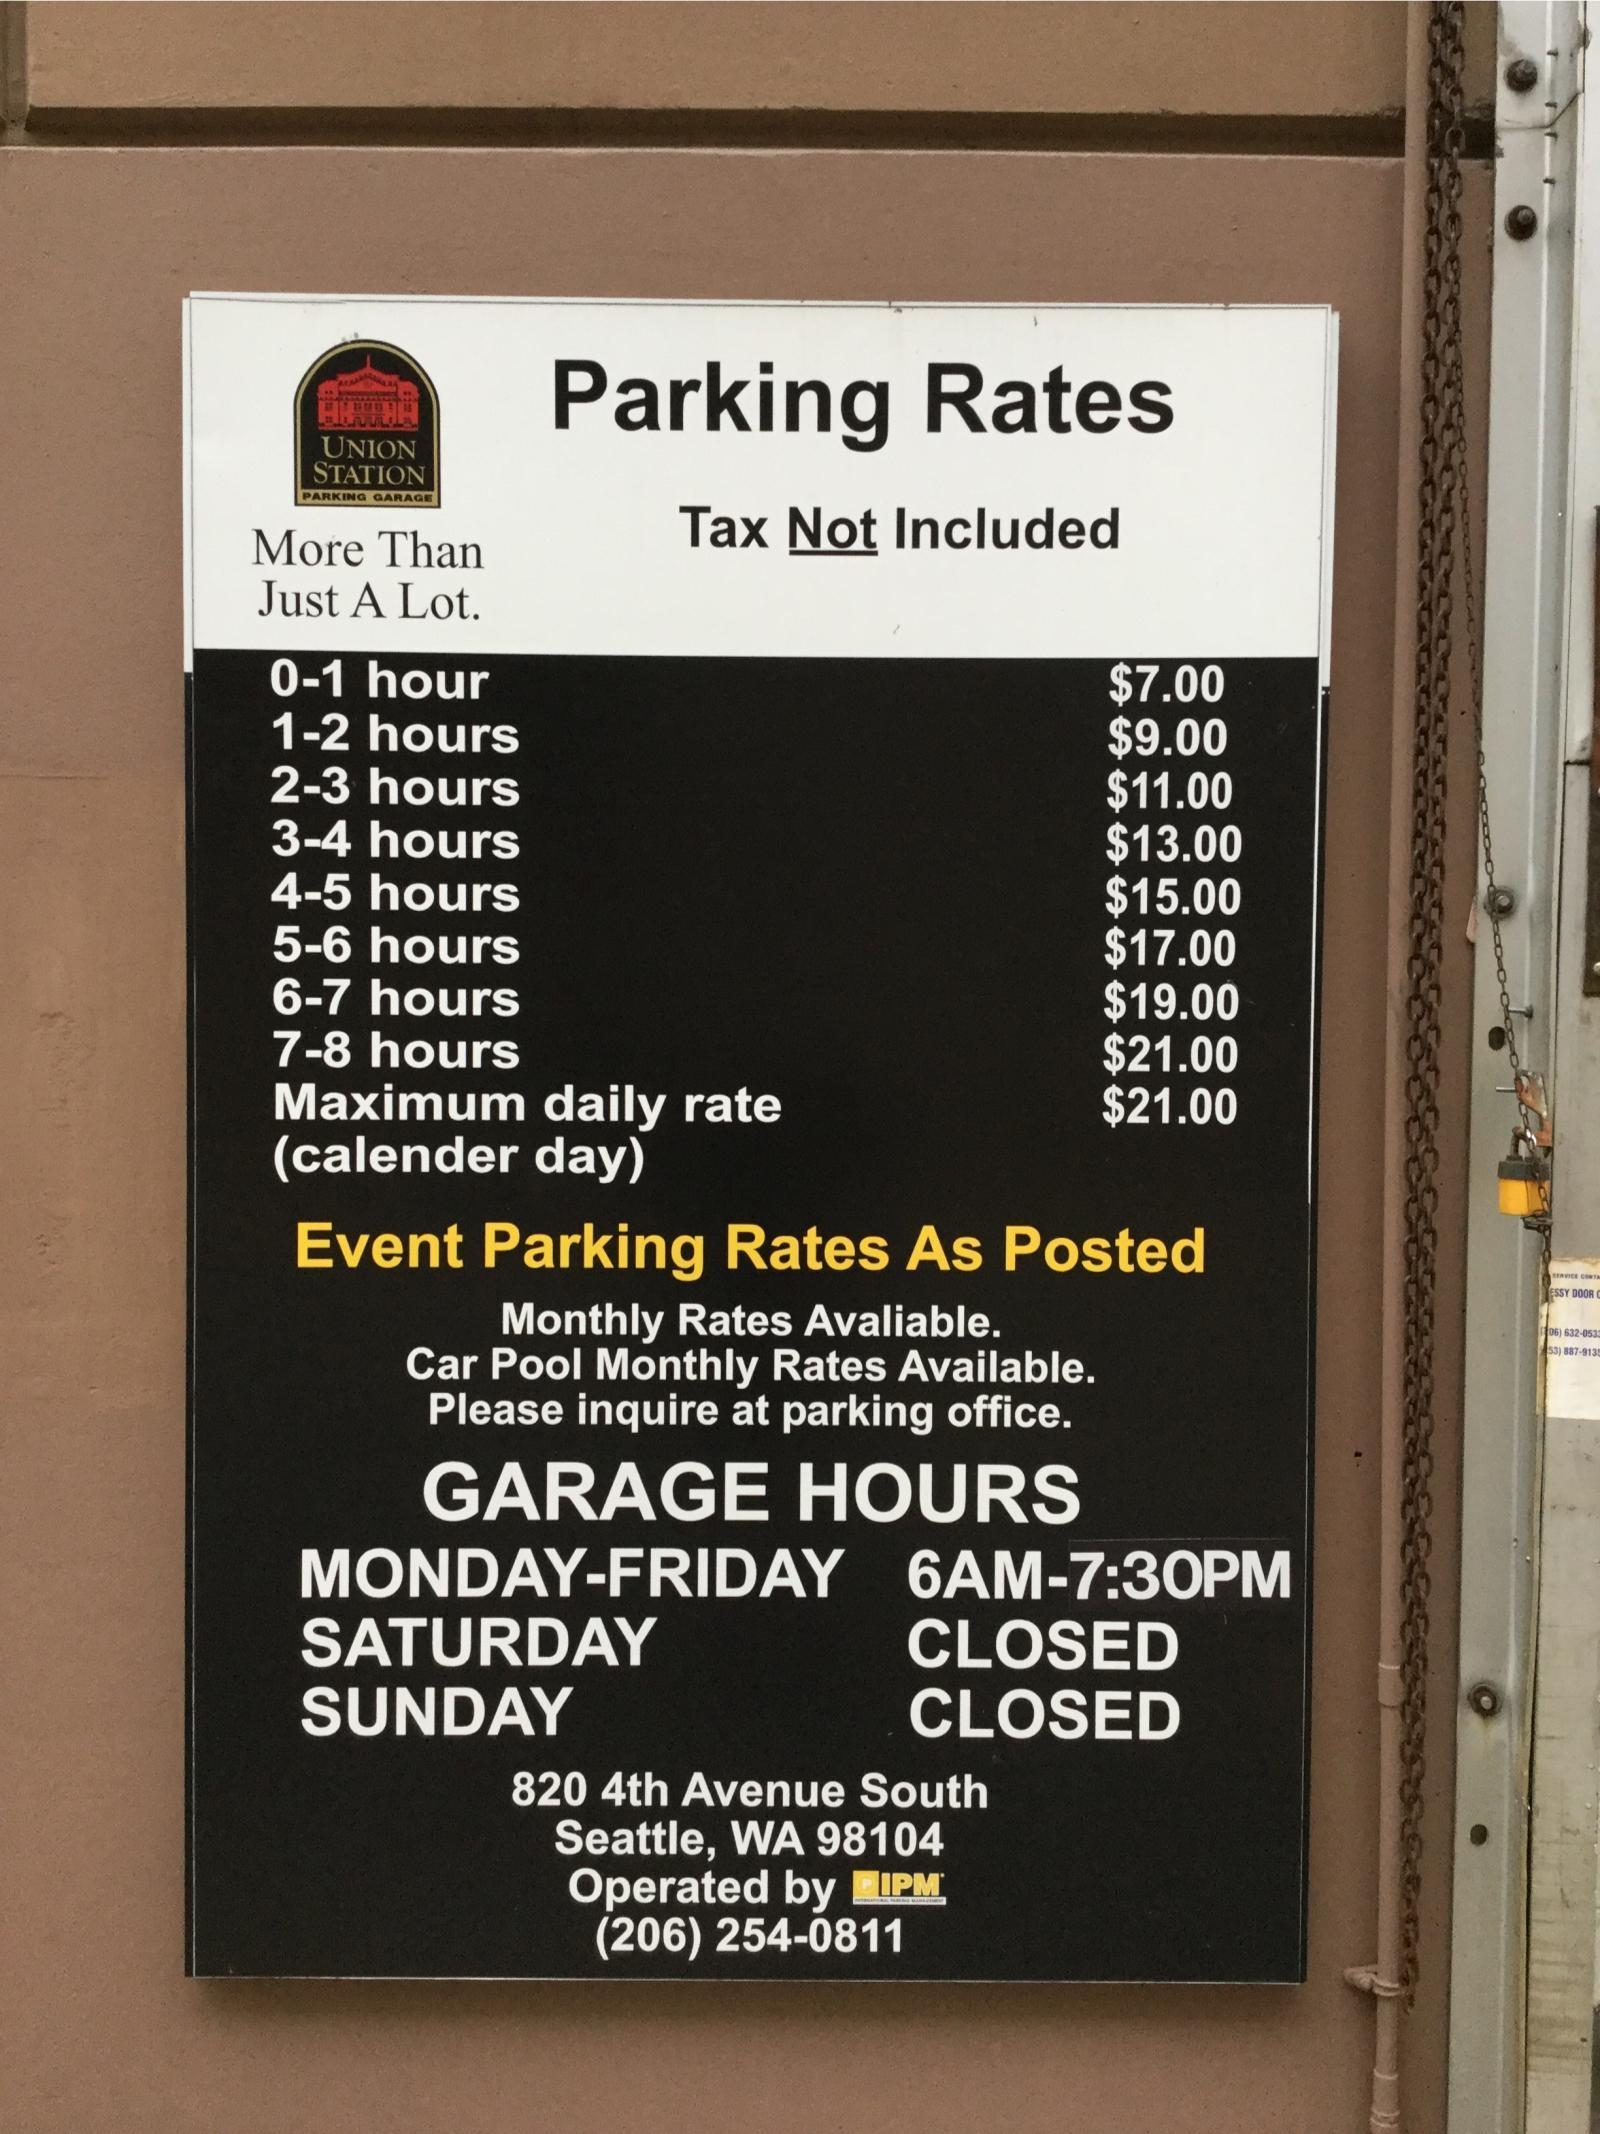 Validating parking at union station